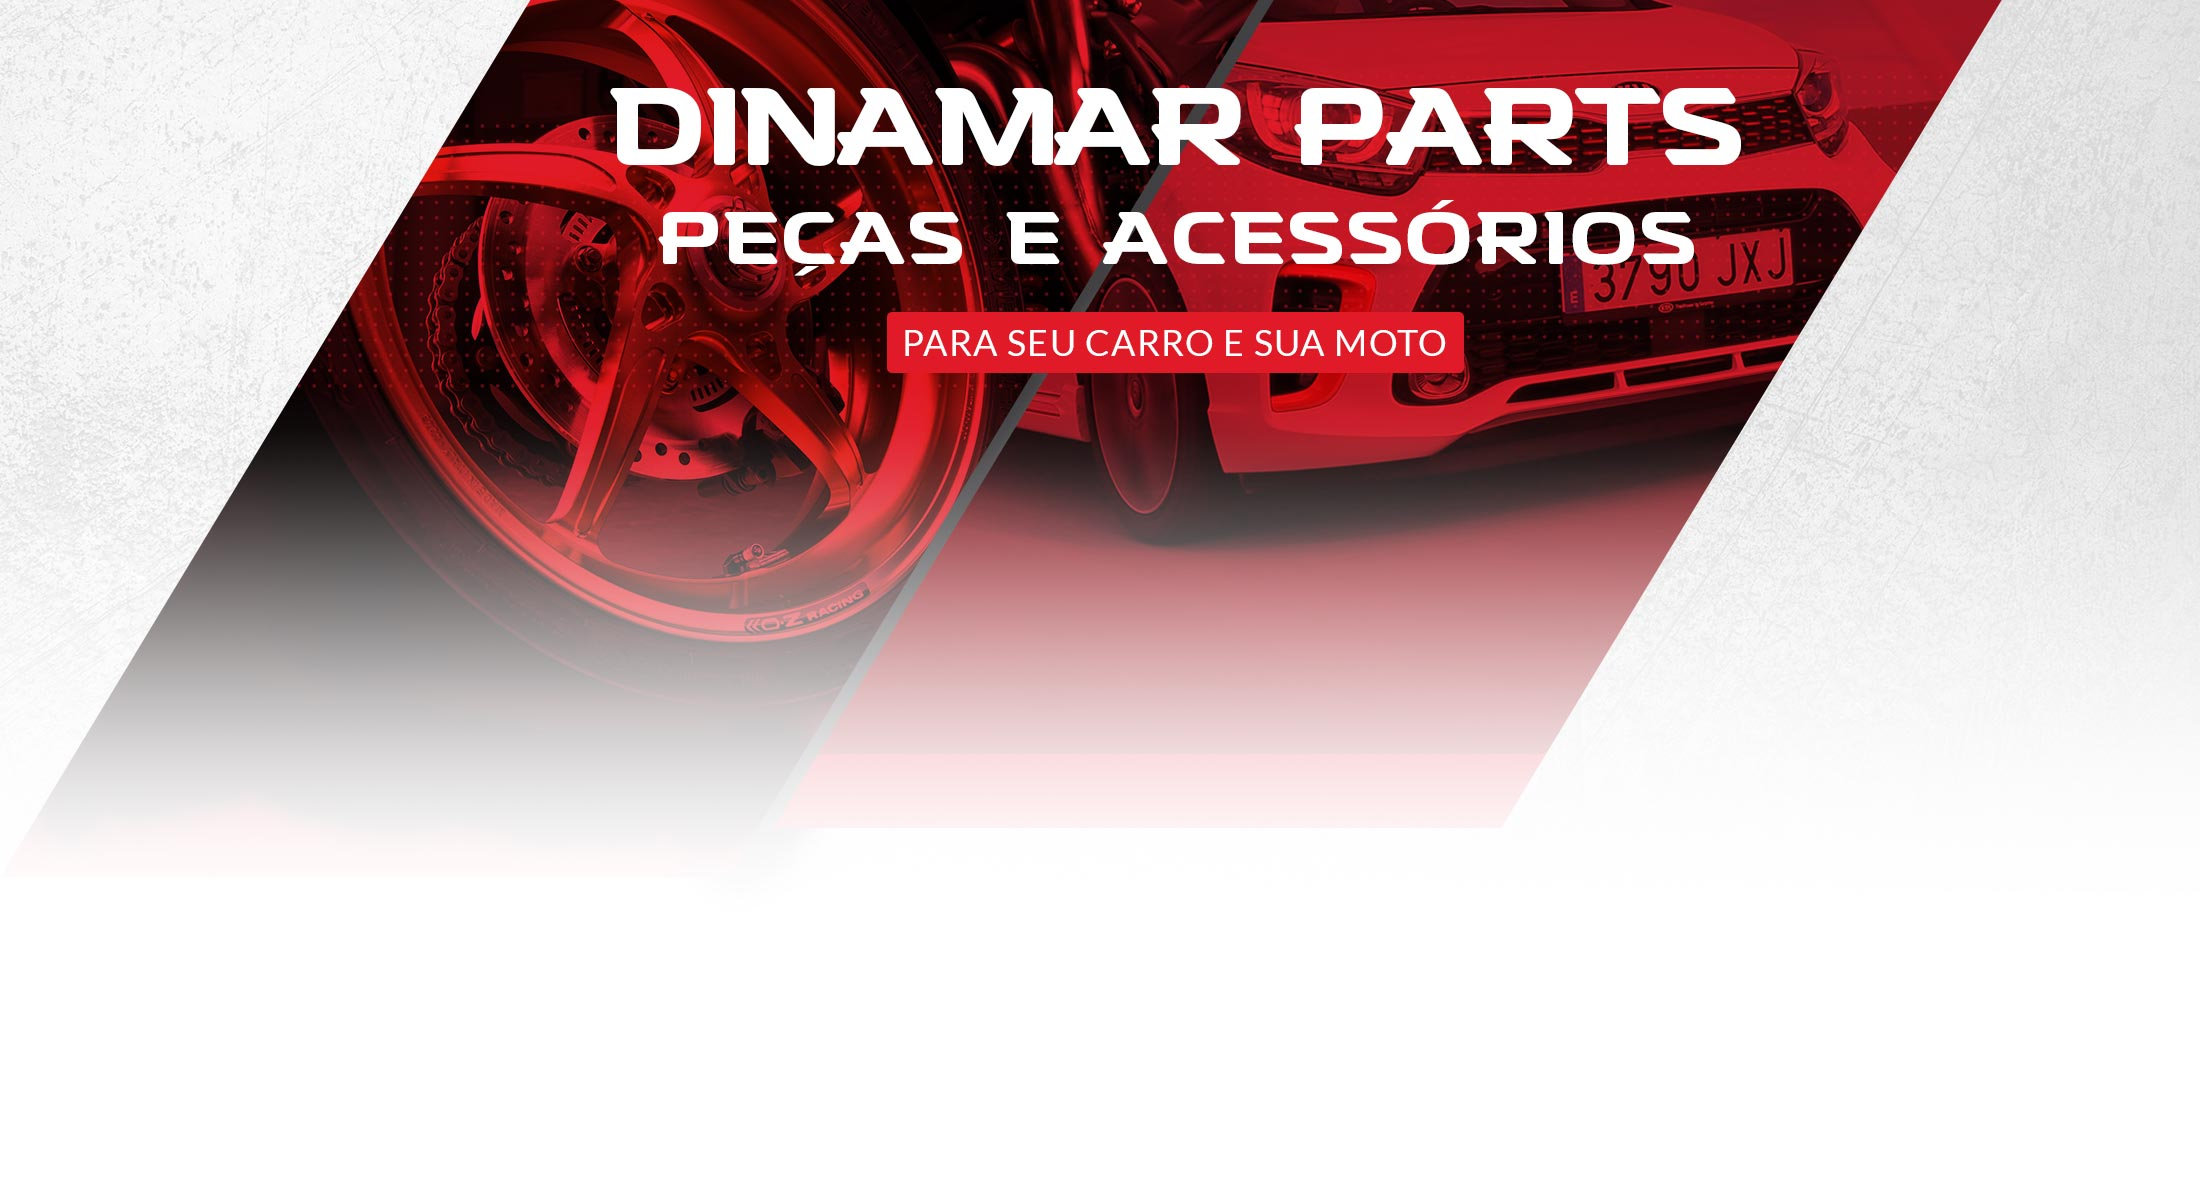 Moto Parts e Auto Parts Dinamar